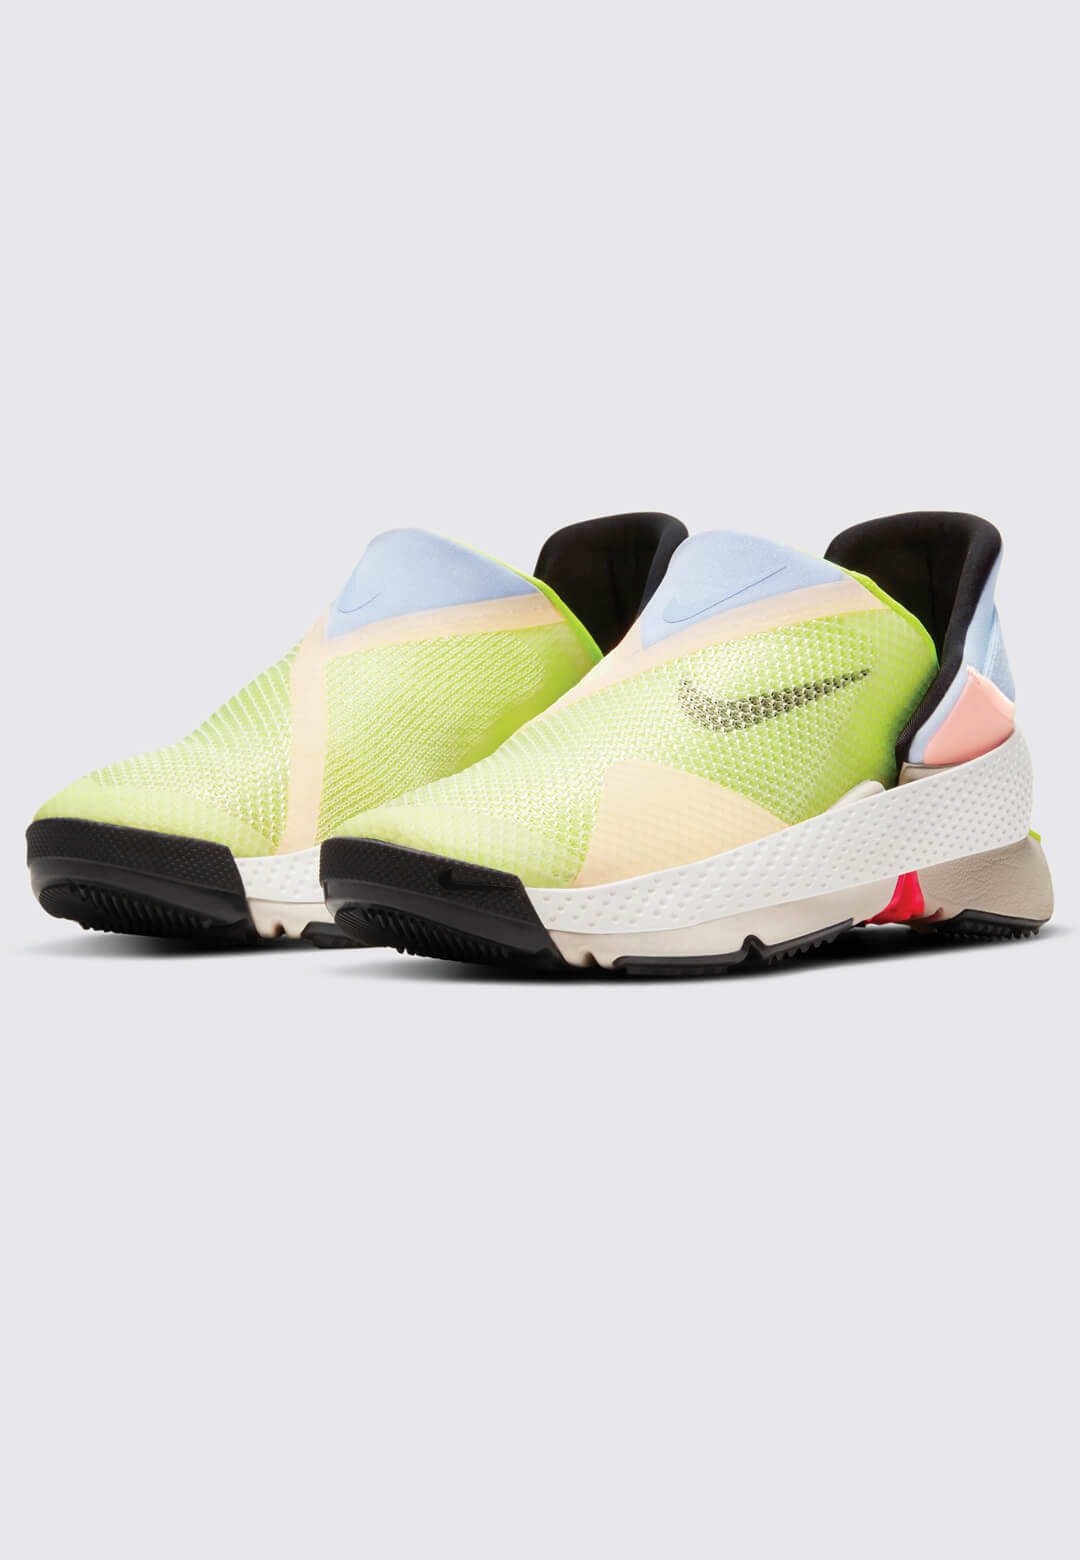 The new Nike GO FlyEase trainers | Nike GO FlyEase | STIRworld